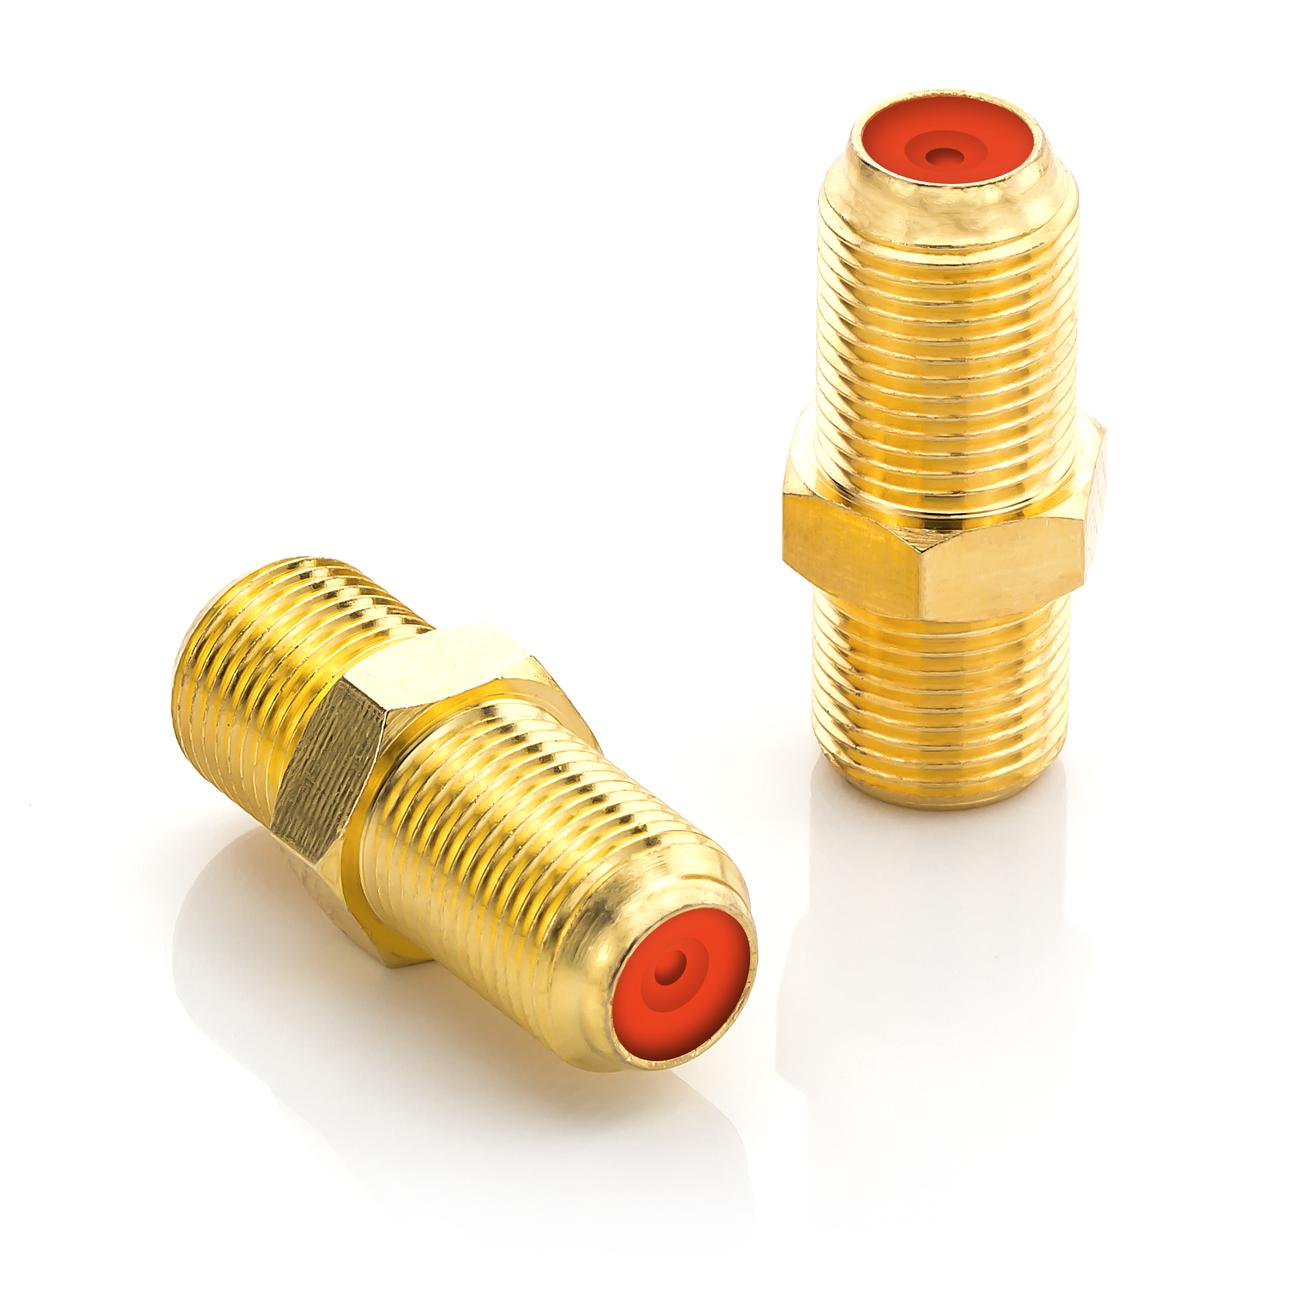 deleycon 2x sat verbinder kupplung sat koaxial kabel adapter verbindung f buchse ebay. Black Bedroom Furniture Sets. Home Design Ideas